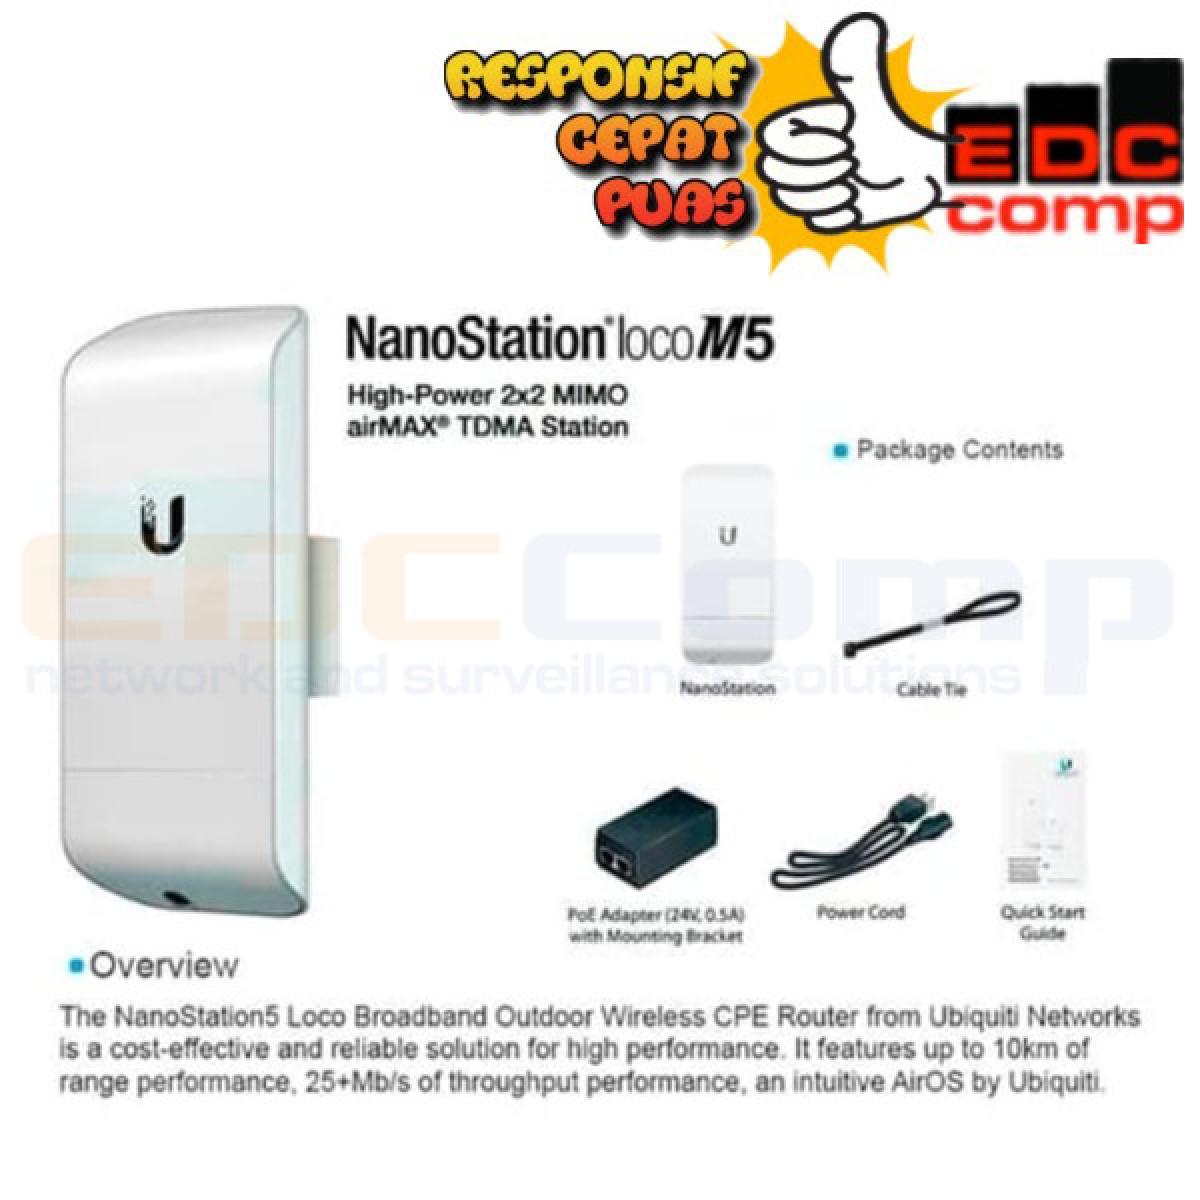 Ubiquiti Nanostaion Loco M5 - EdcComp